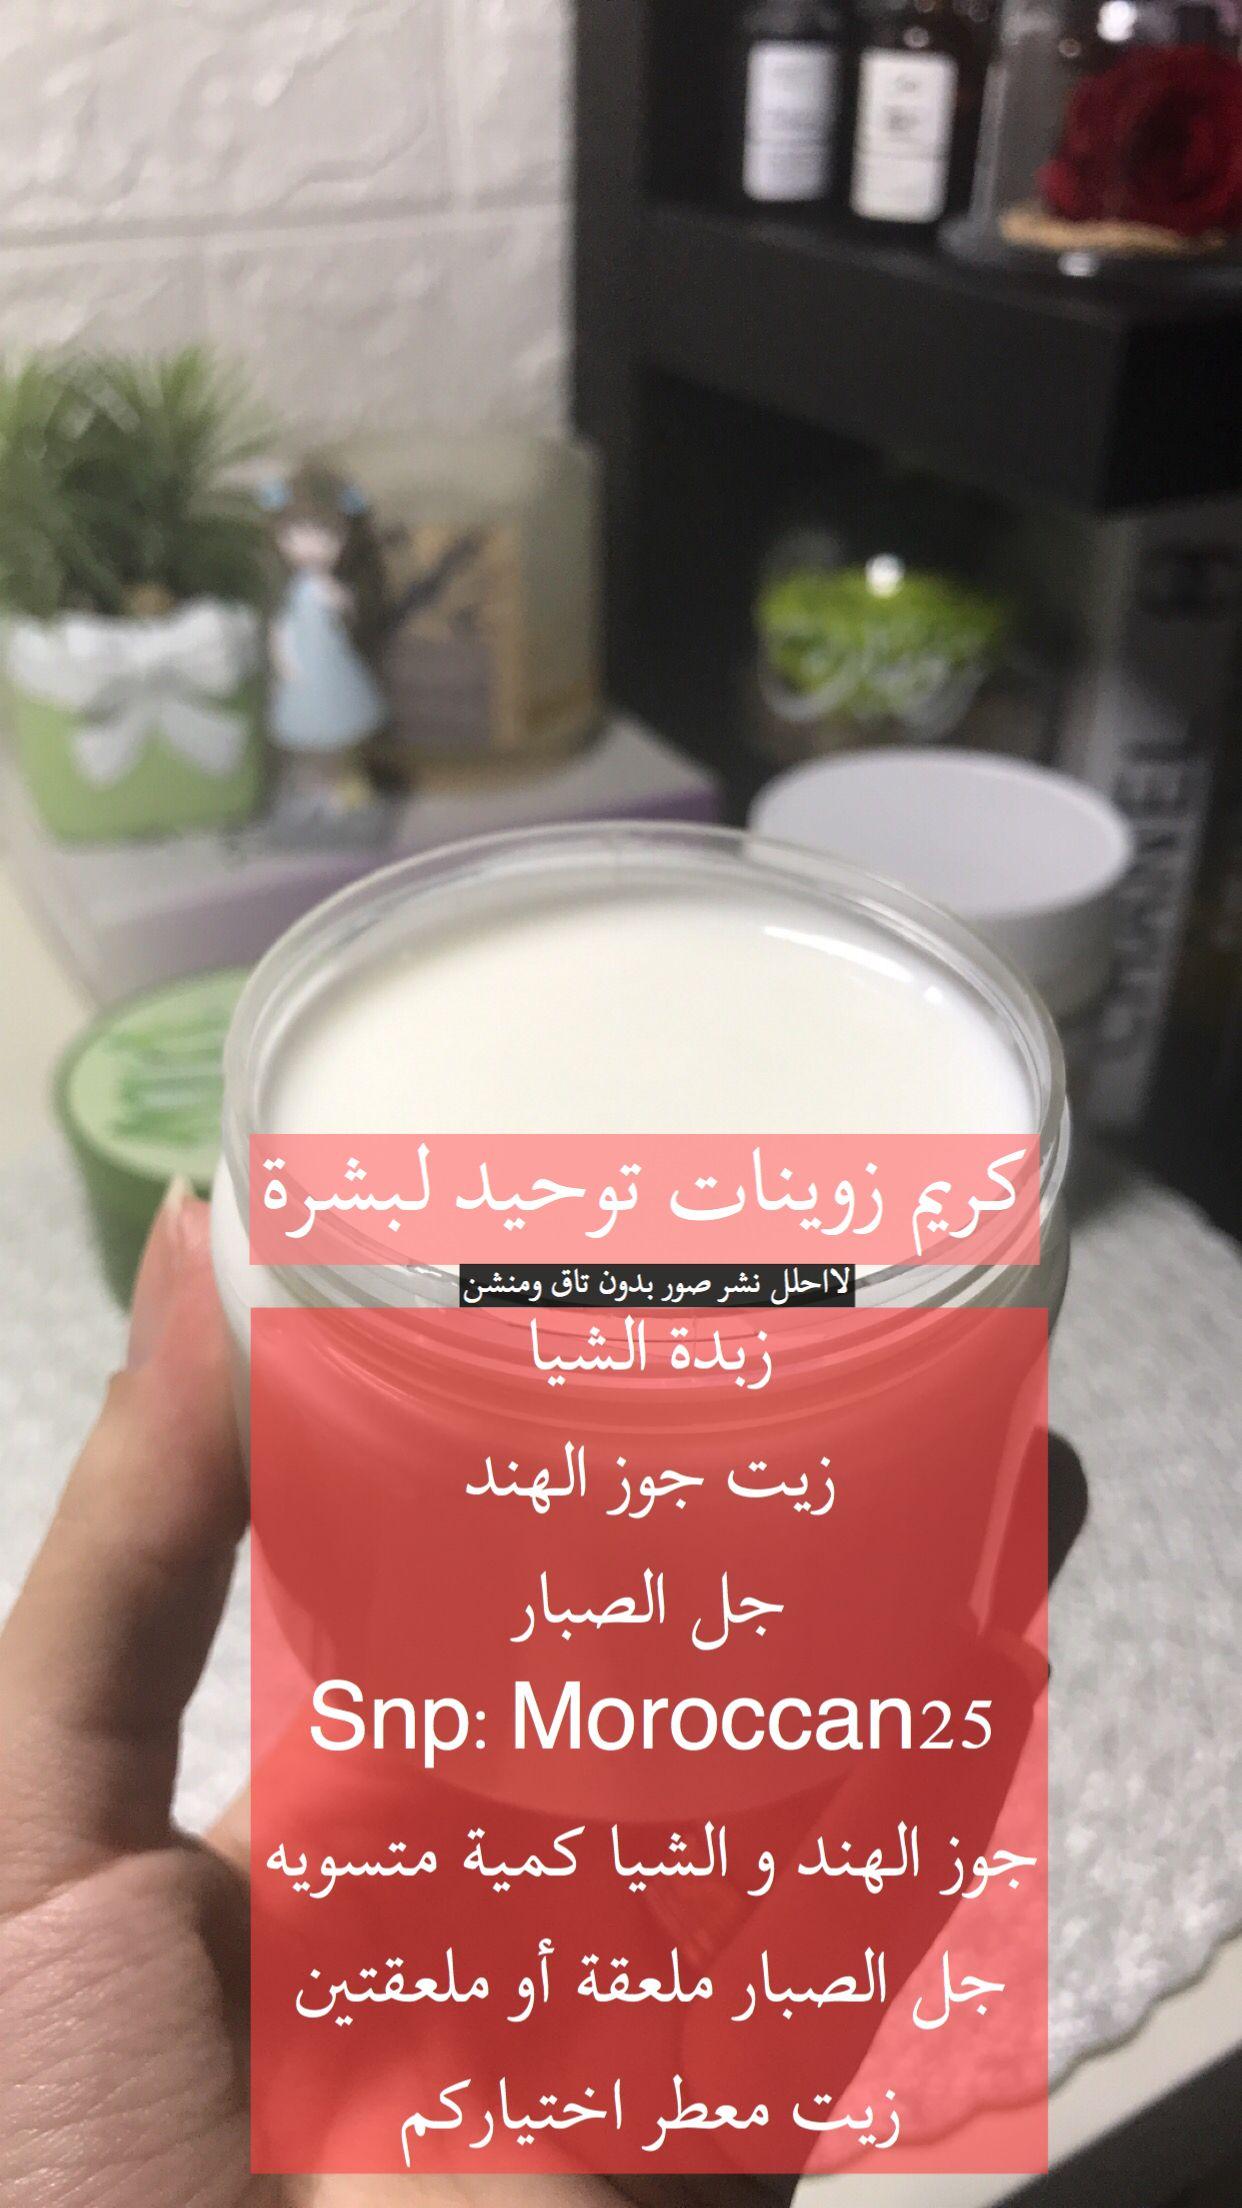 مرحبا بكم Inst Moroccan Zawinati Snp Moroccan25 Skin Care Essentials Natural Skin Care Diy Skin Care Diy Masks